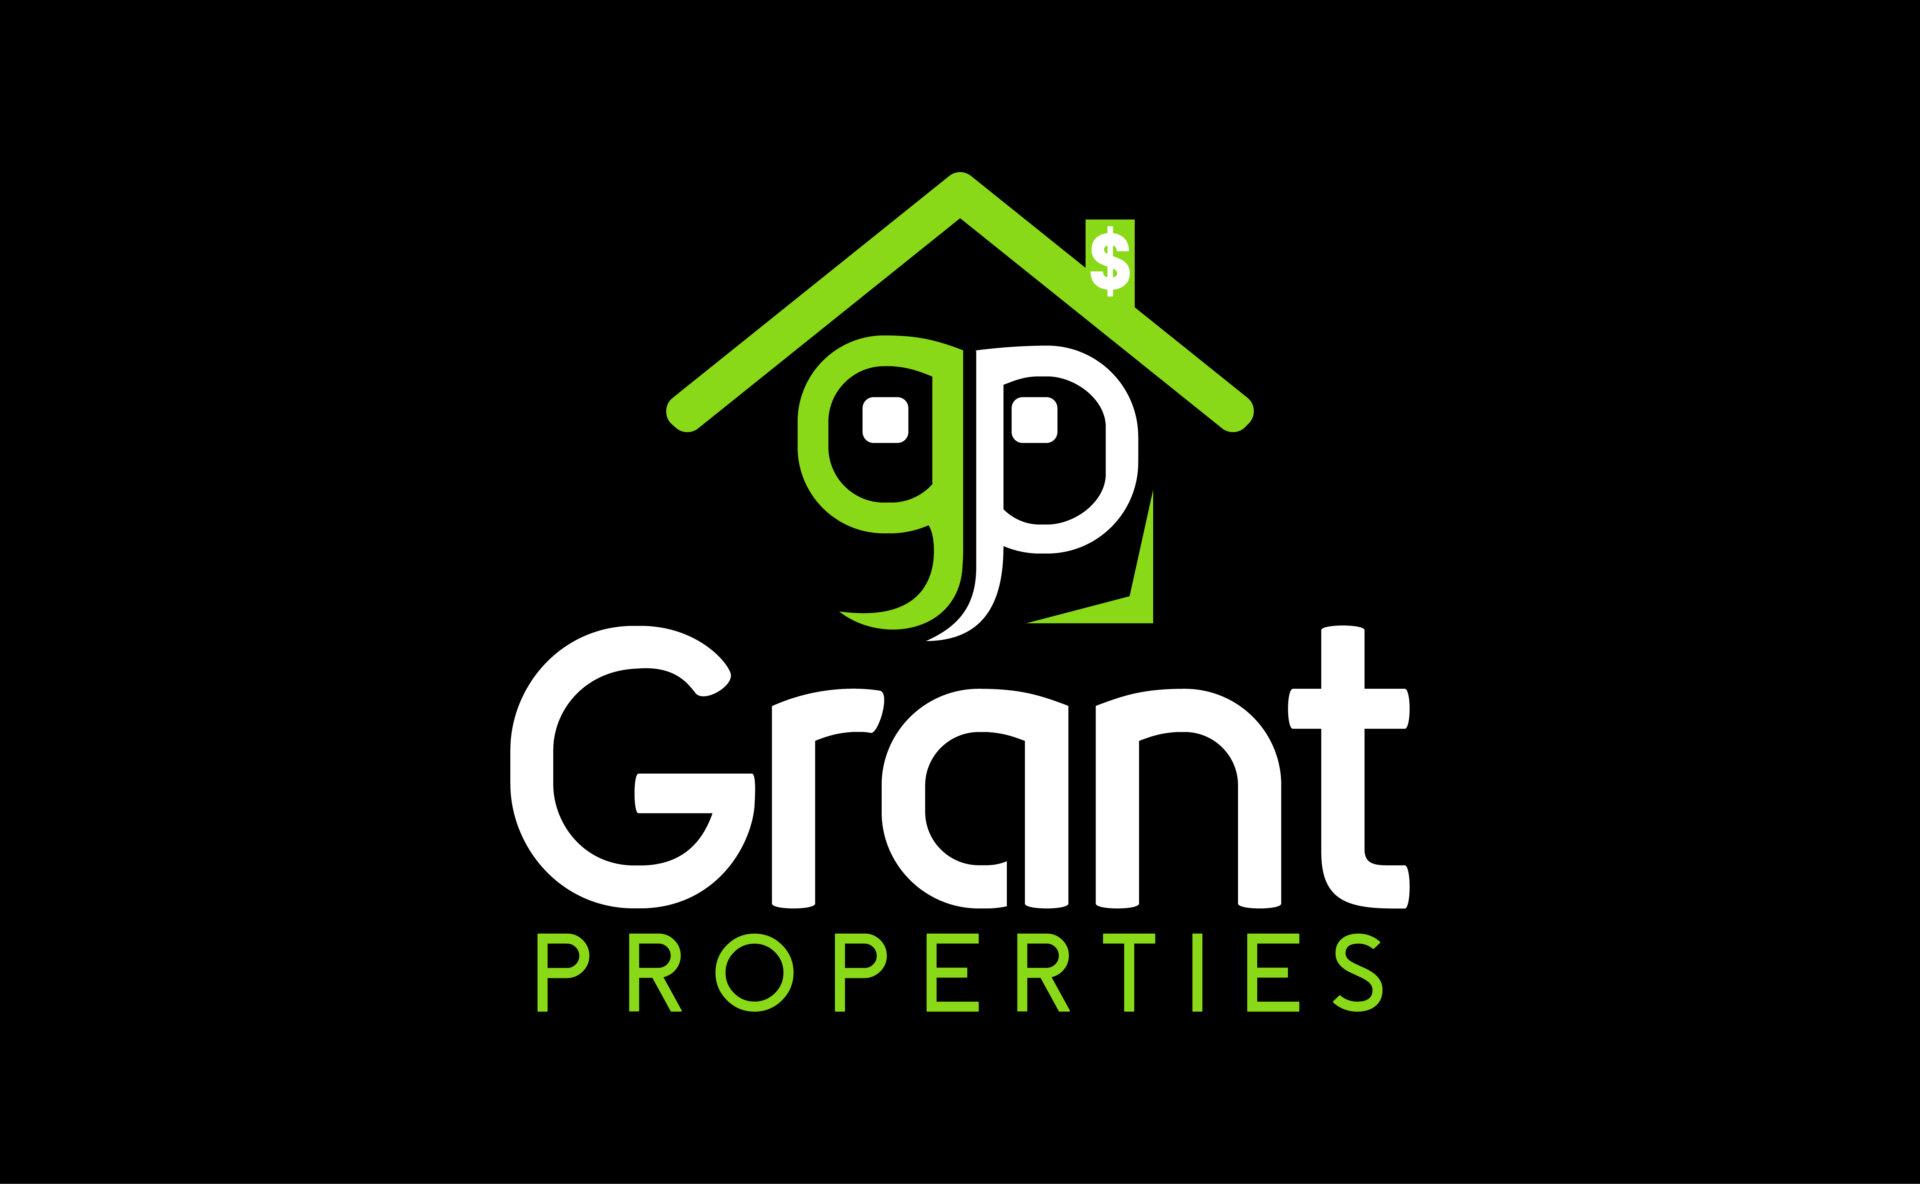 GP Real Estate Services logo